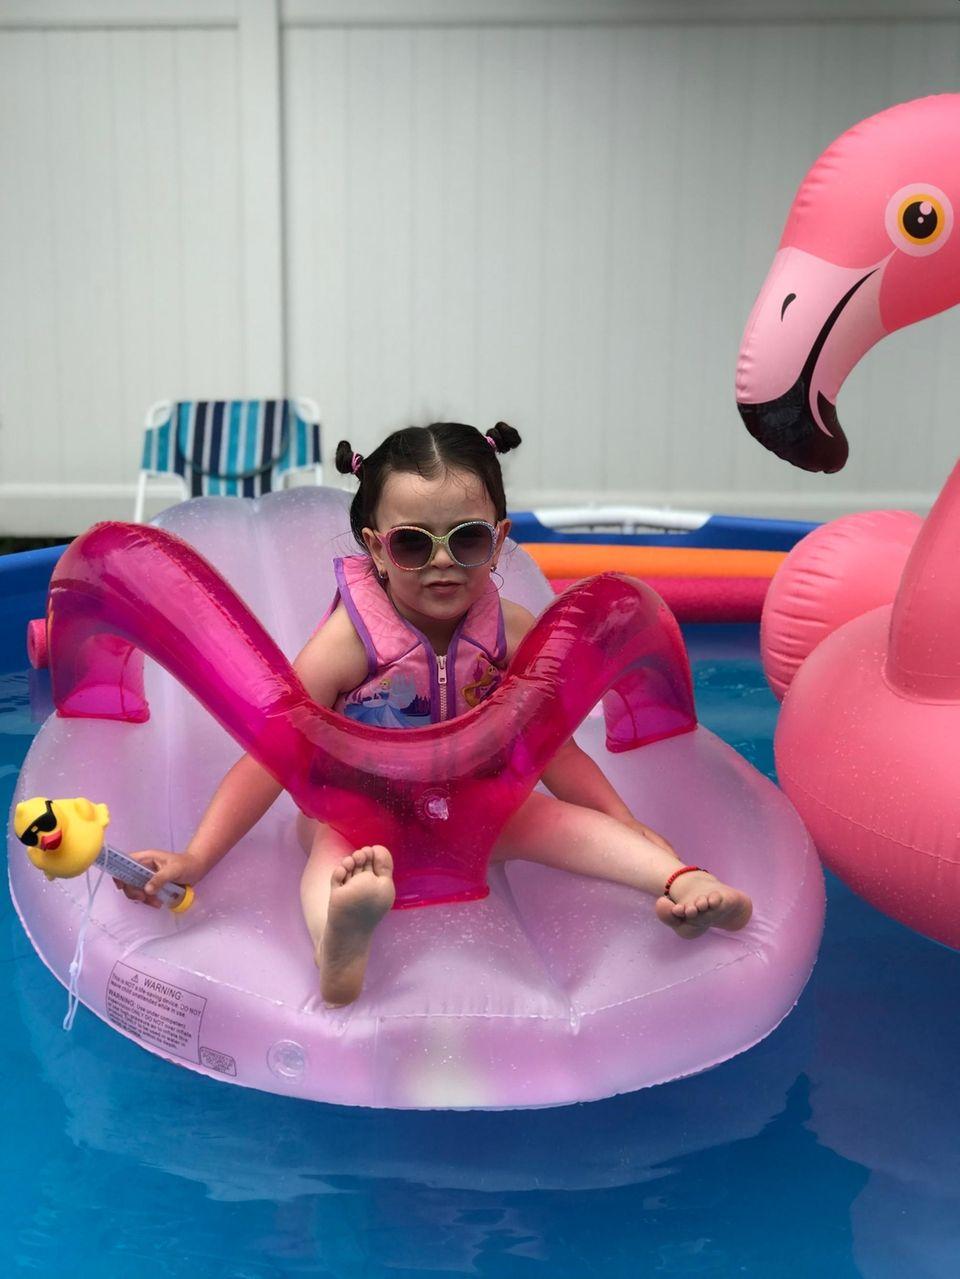 Leah irizarry is at her backyard enjoying summer